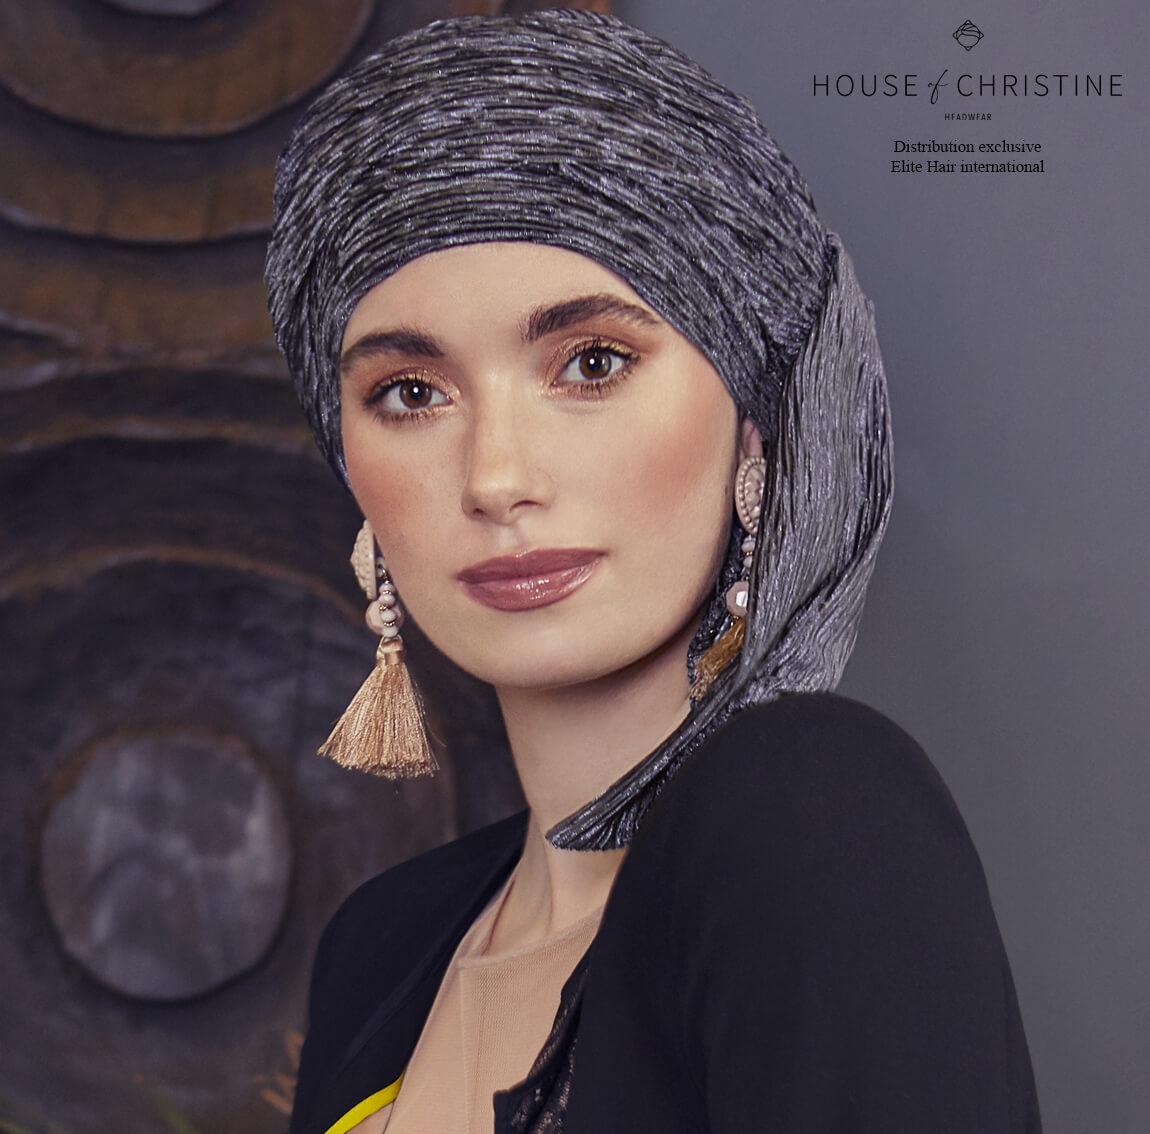 Bonnet chimio boho foulard amovible, rêverie, christine headwear